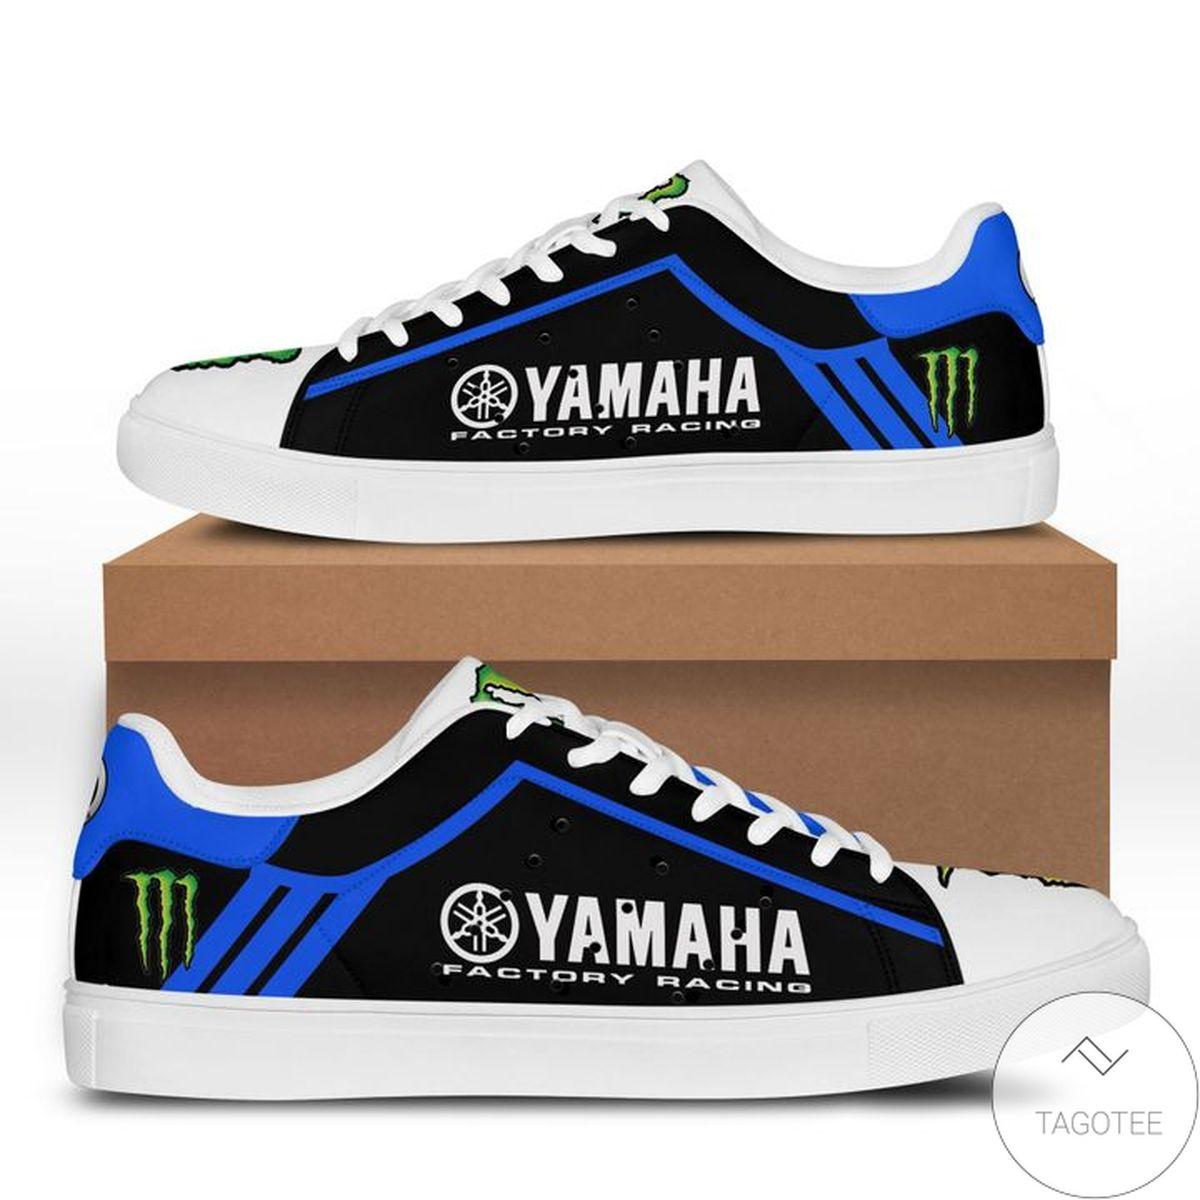 Clothing Yamaha Racing Blue Stan Smith Shoes